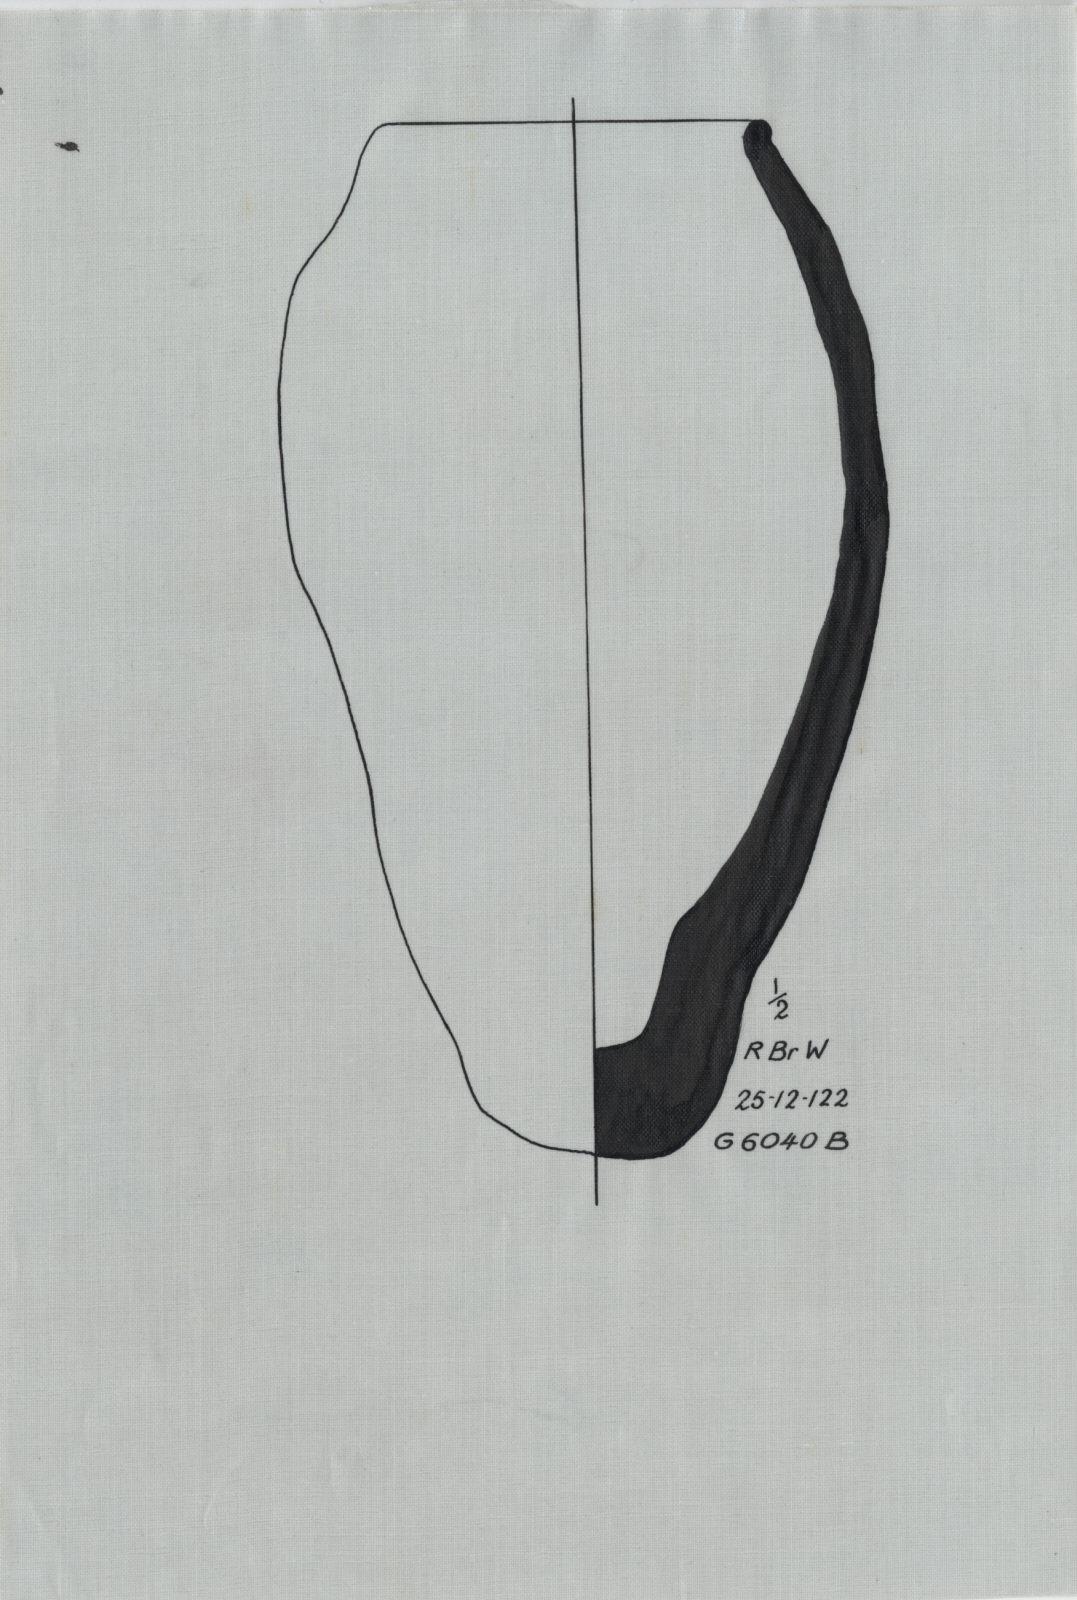 Drawings: G 6040, Shaft B: pottery, offering jar